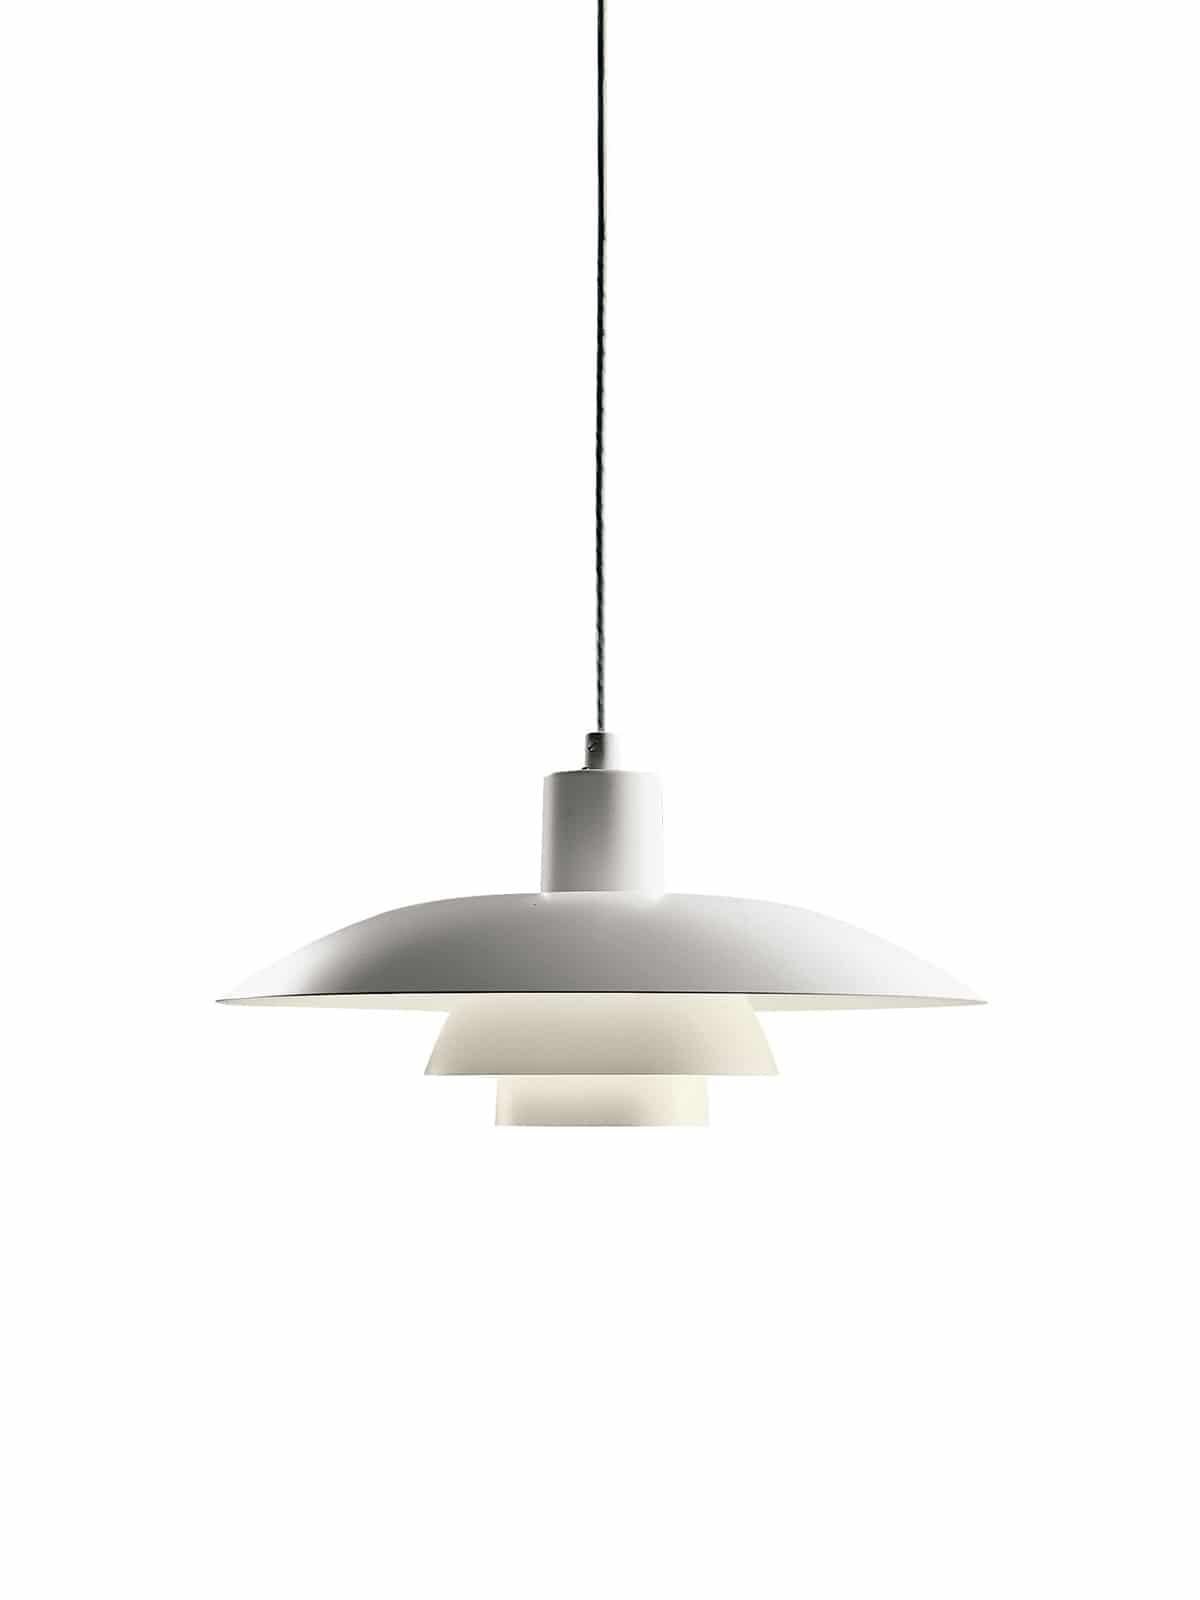 ph 4 3 lampen leuchten designerleuchten online berlin design. Black Bedroom Furniture Sets. Home Design Ideas